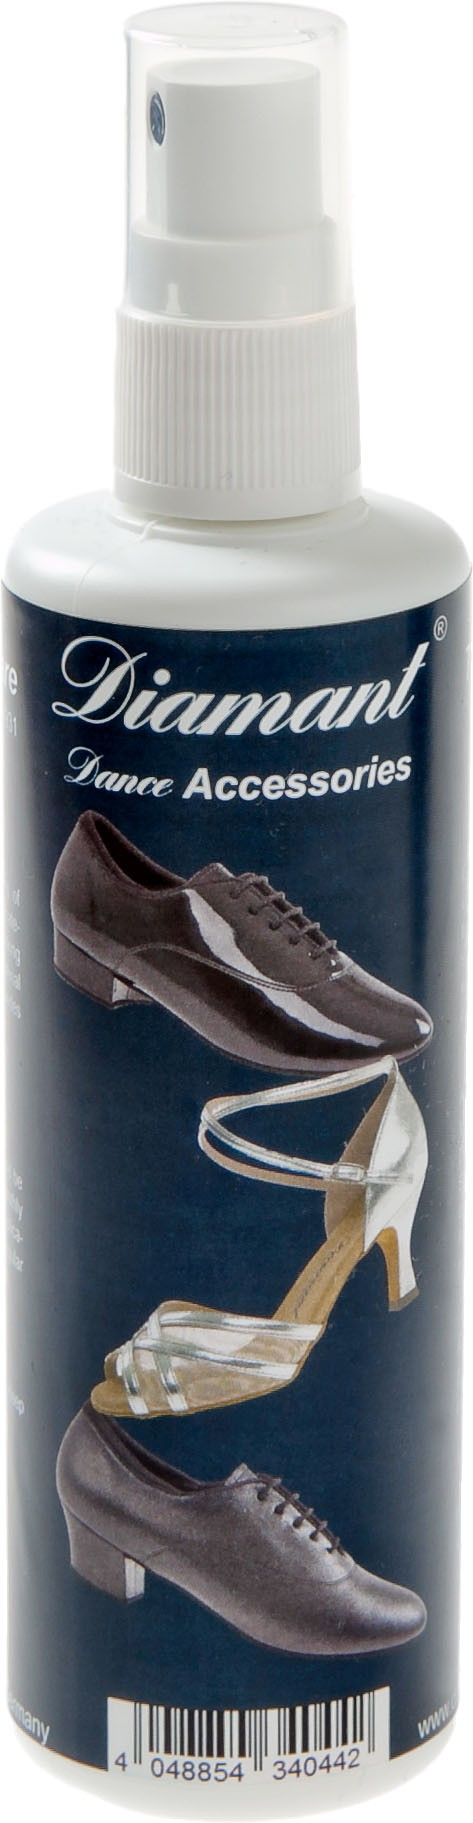 Diamant Tanzschuh Pflegemittel HW10931, ohne